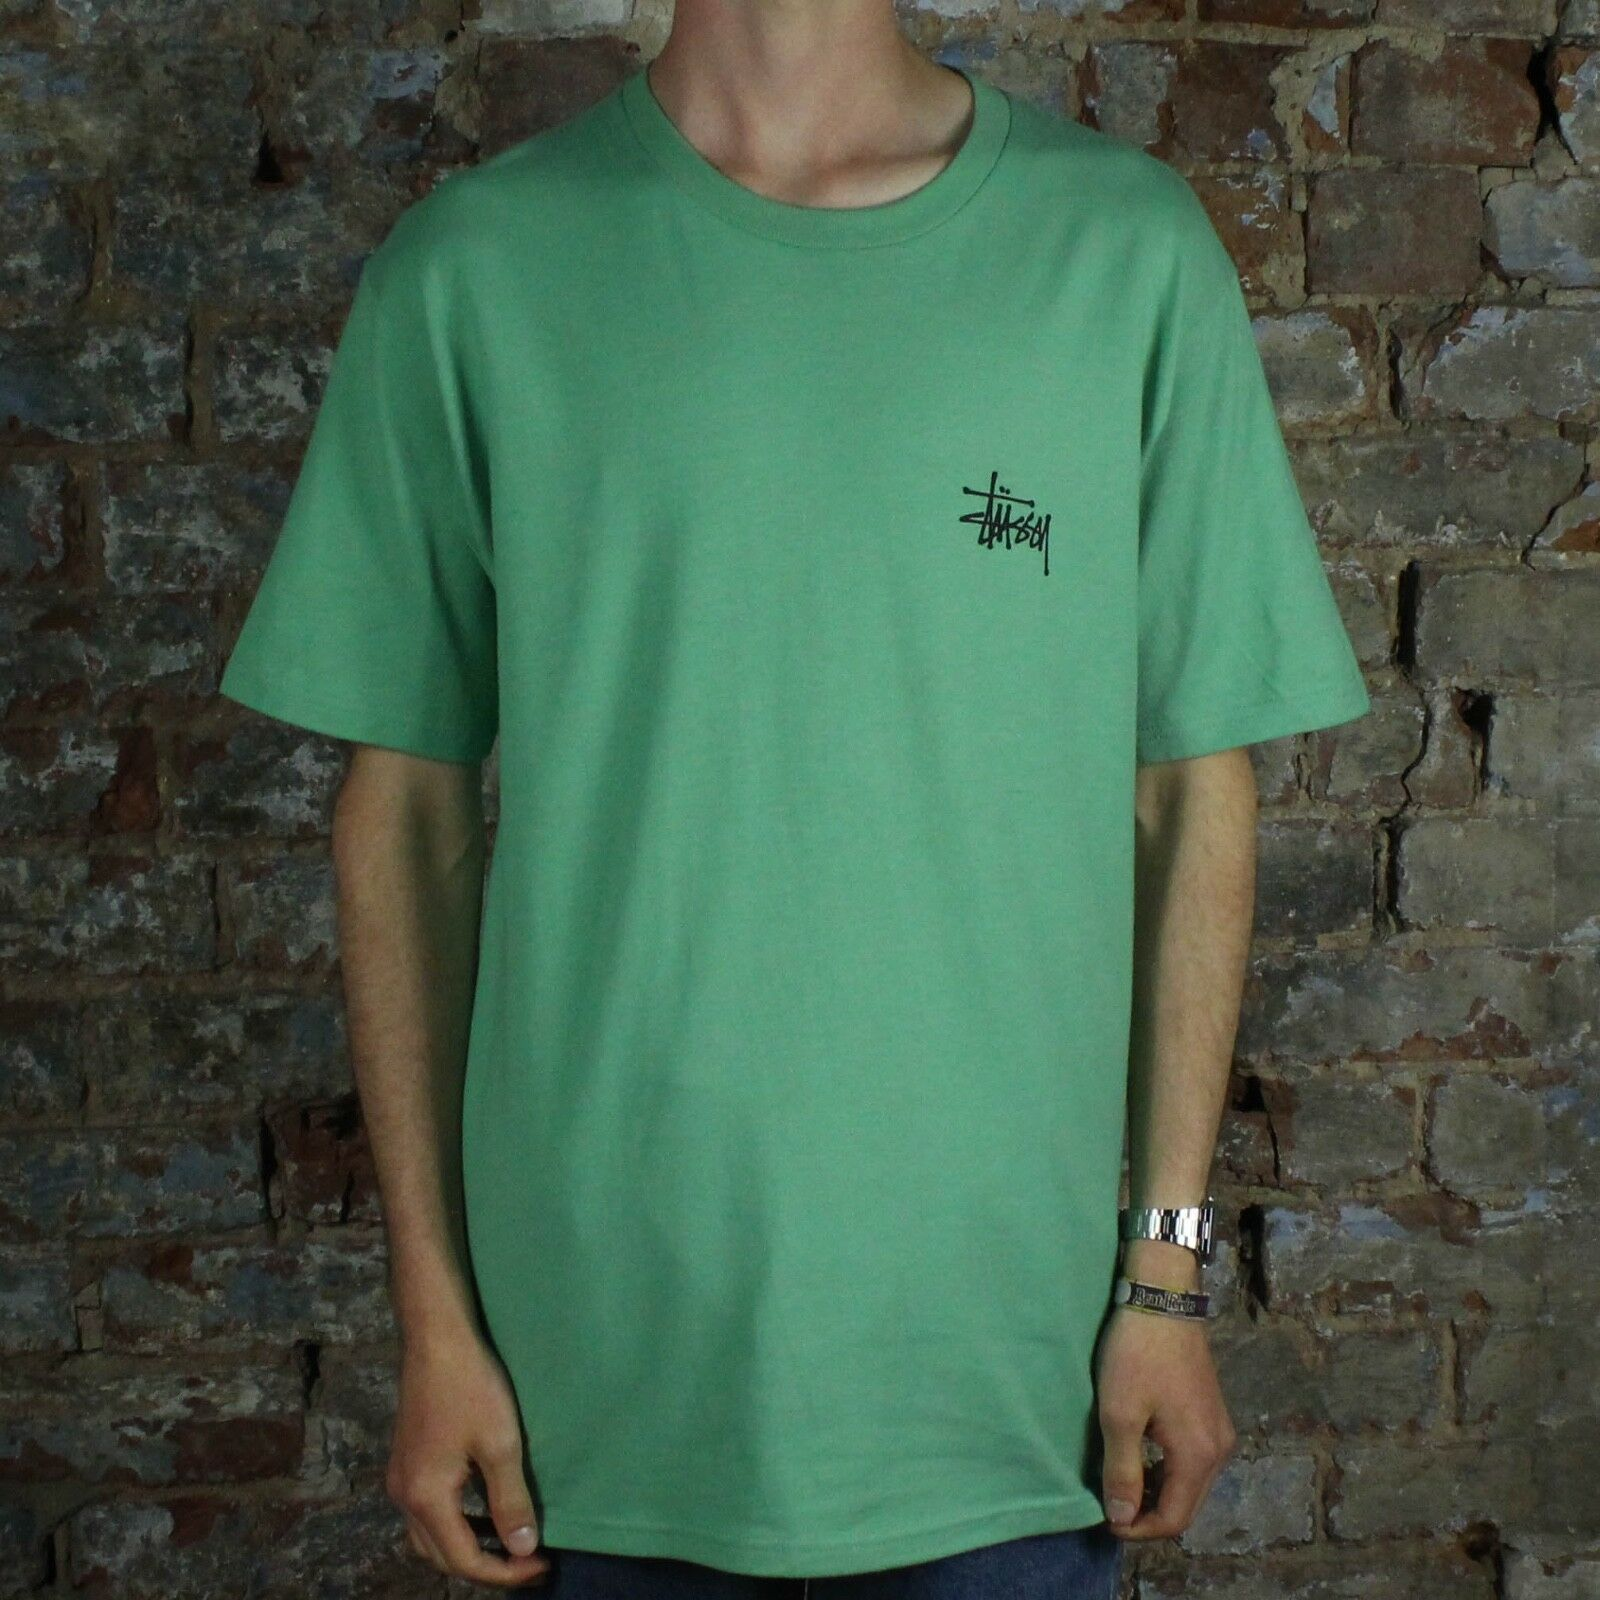 Stussy Basic T-Shirt Tee Brand New in Moss in Größe S,M,L,XL